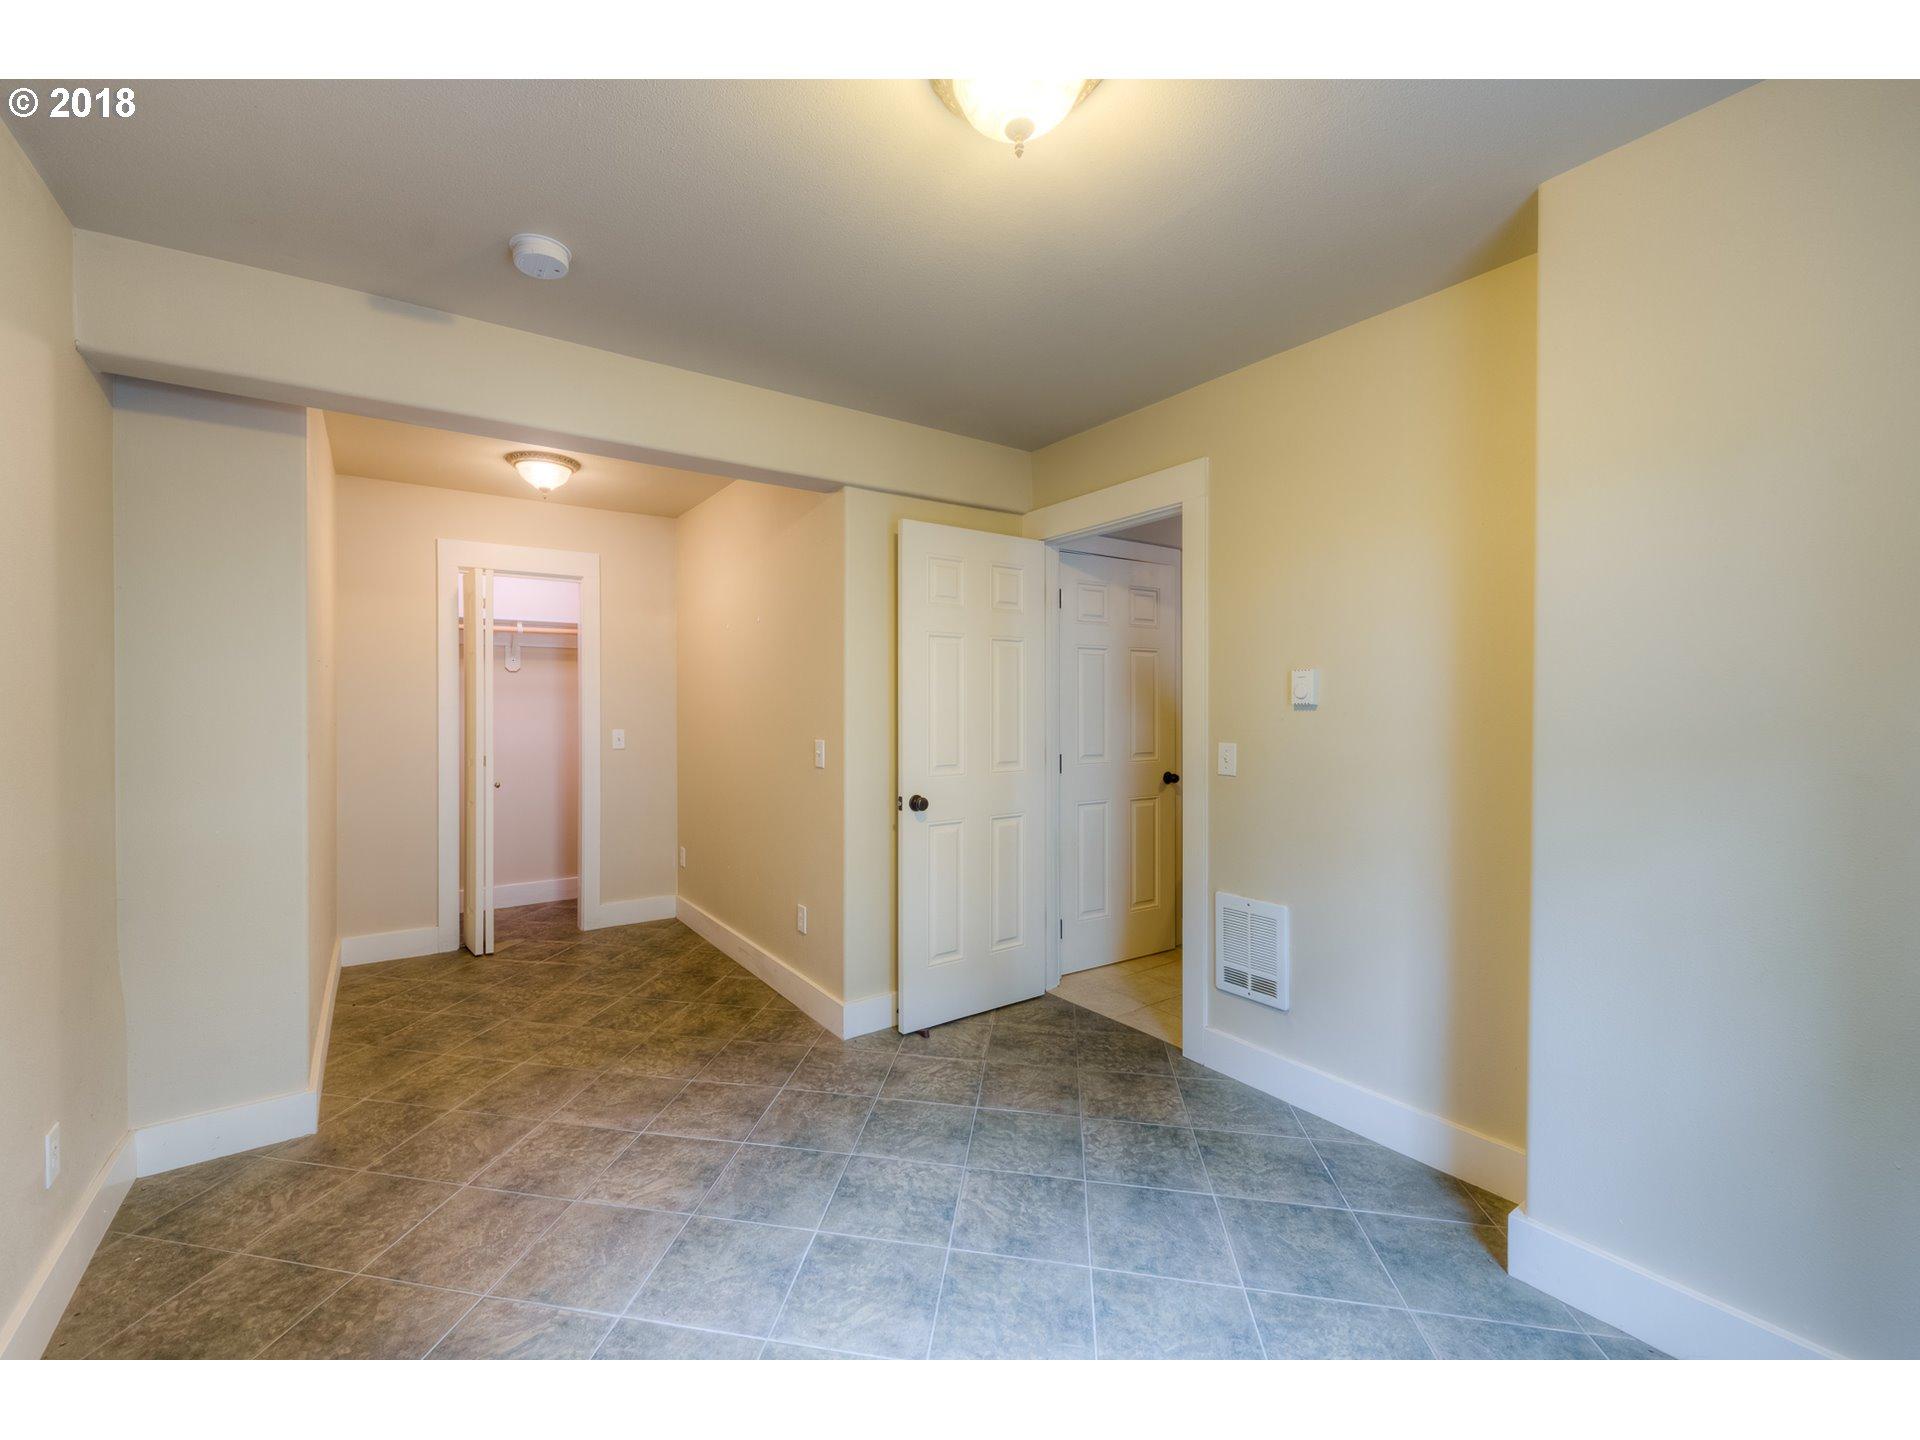 584 8th ST Astoria, OR 97103 - MLS #: 18652839